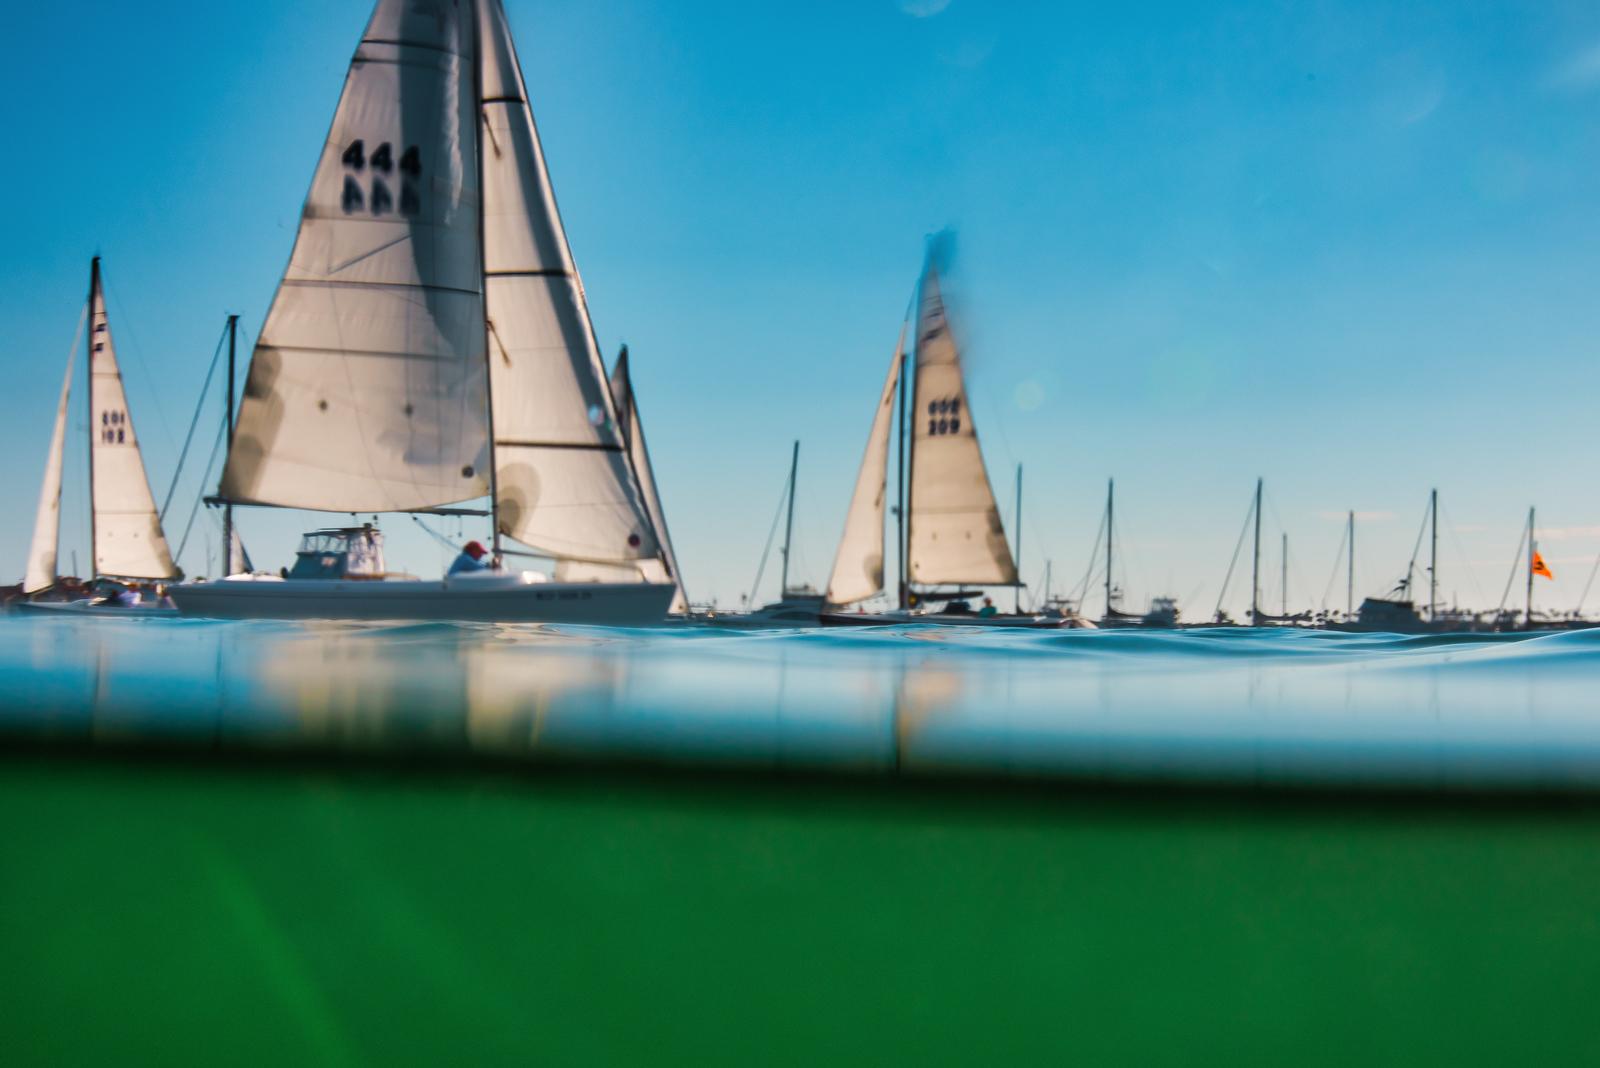 7/5/176:01:12 PM---TWednesday Night Twilight Racing at Balboa Yacht ClubPhotos  Tom Walker